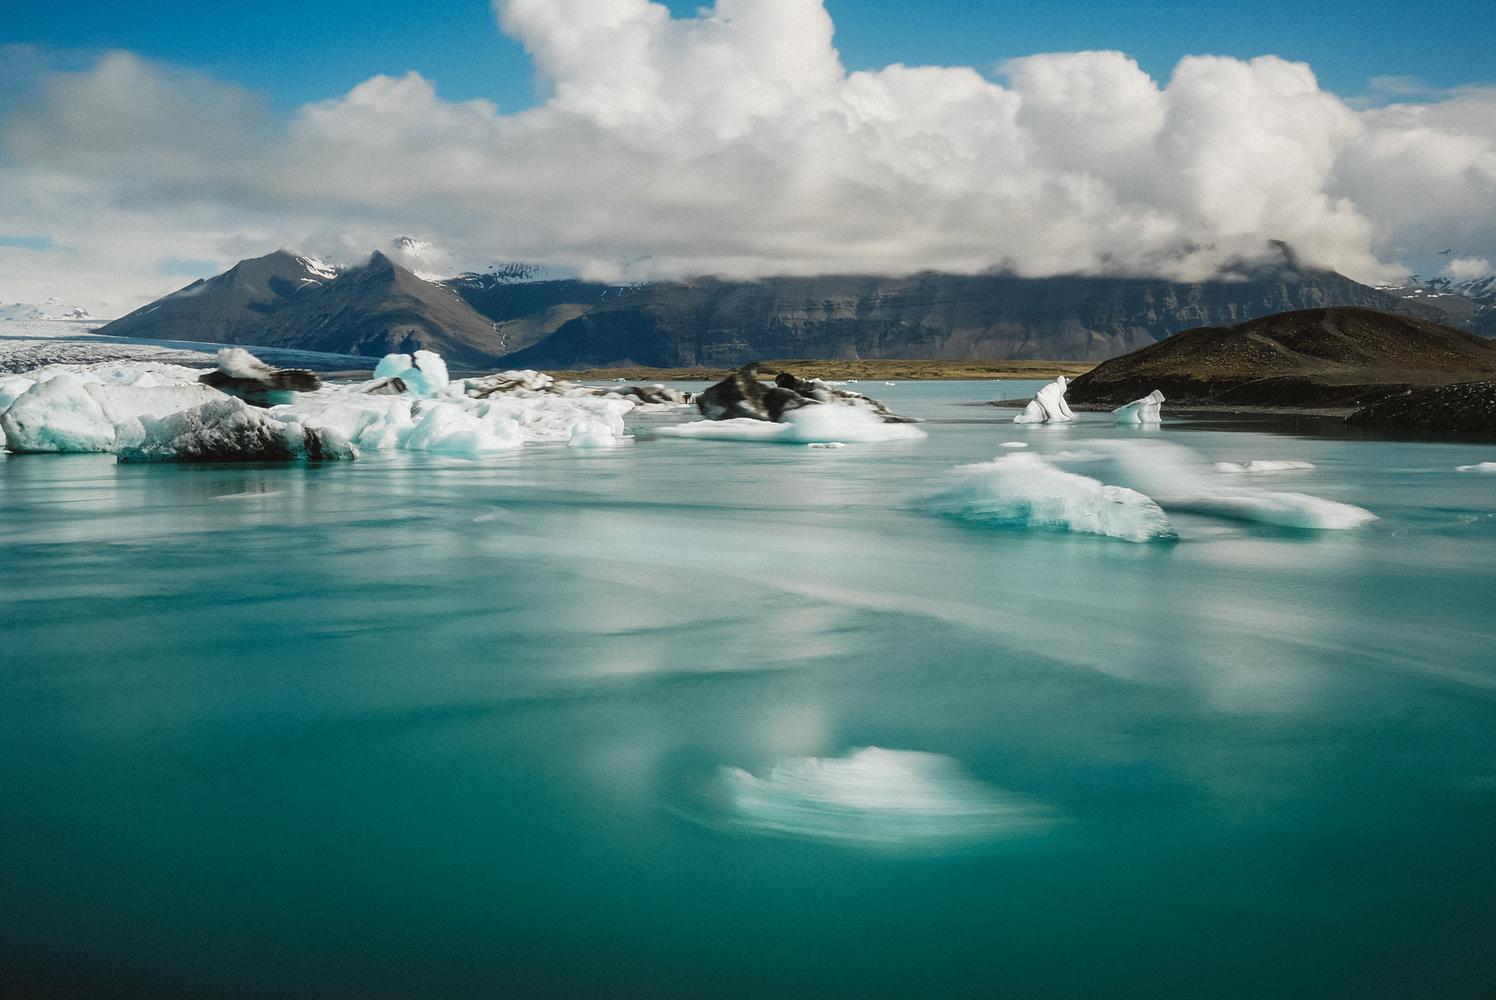 The floating ice of Jökulsárlón by Sam Green